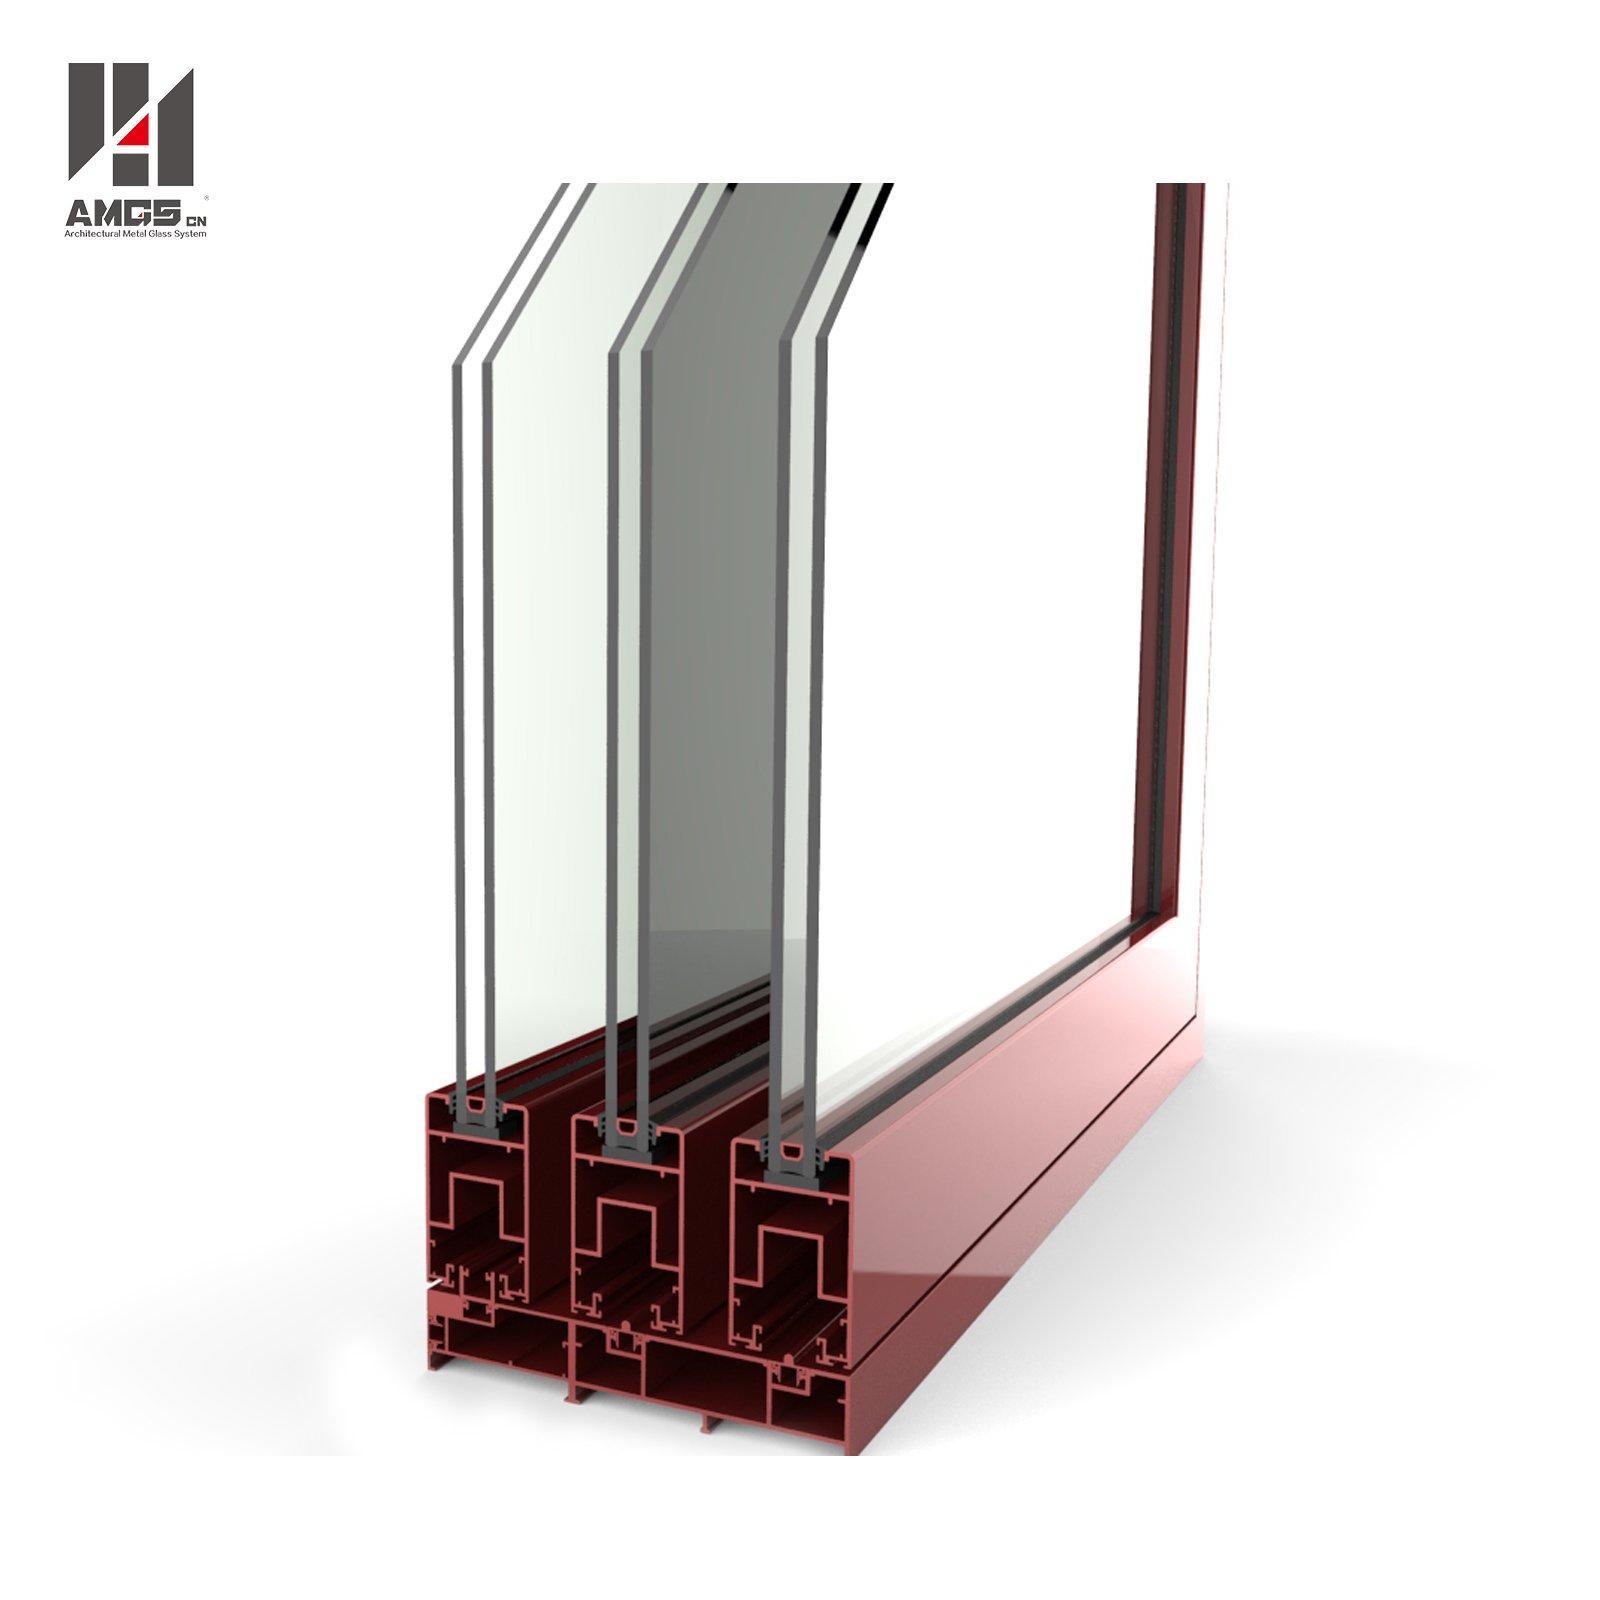 Customized Aluminum Sliding Door For Commercial And Residen